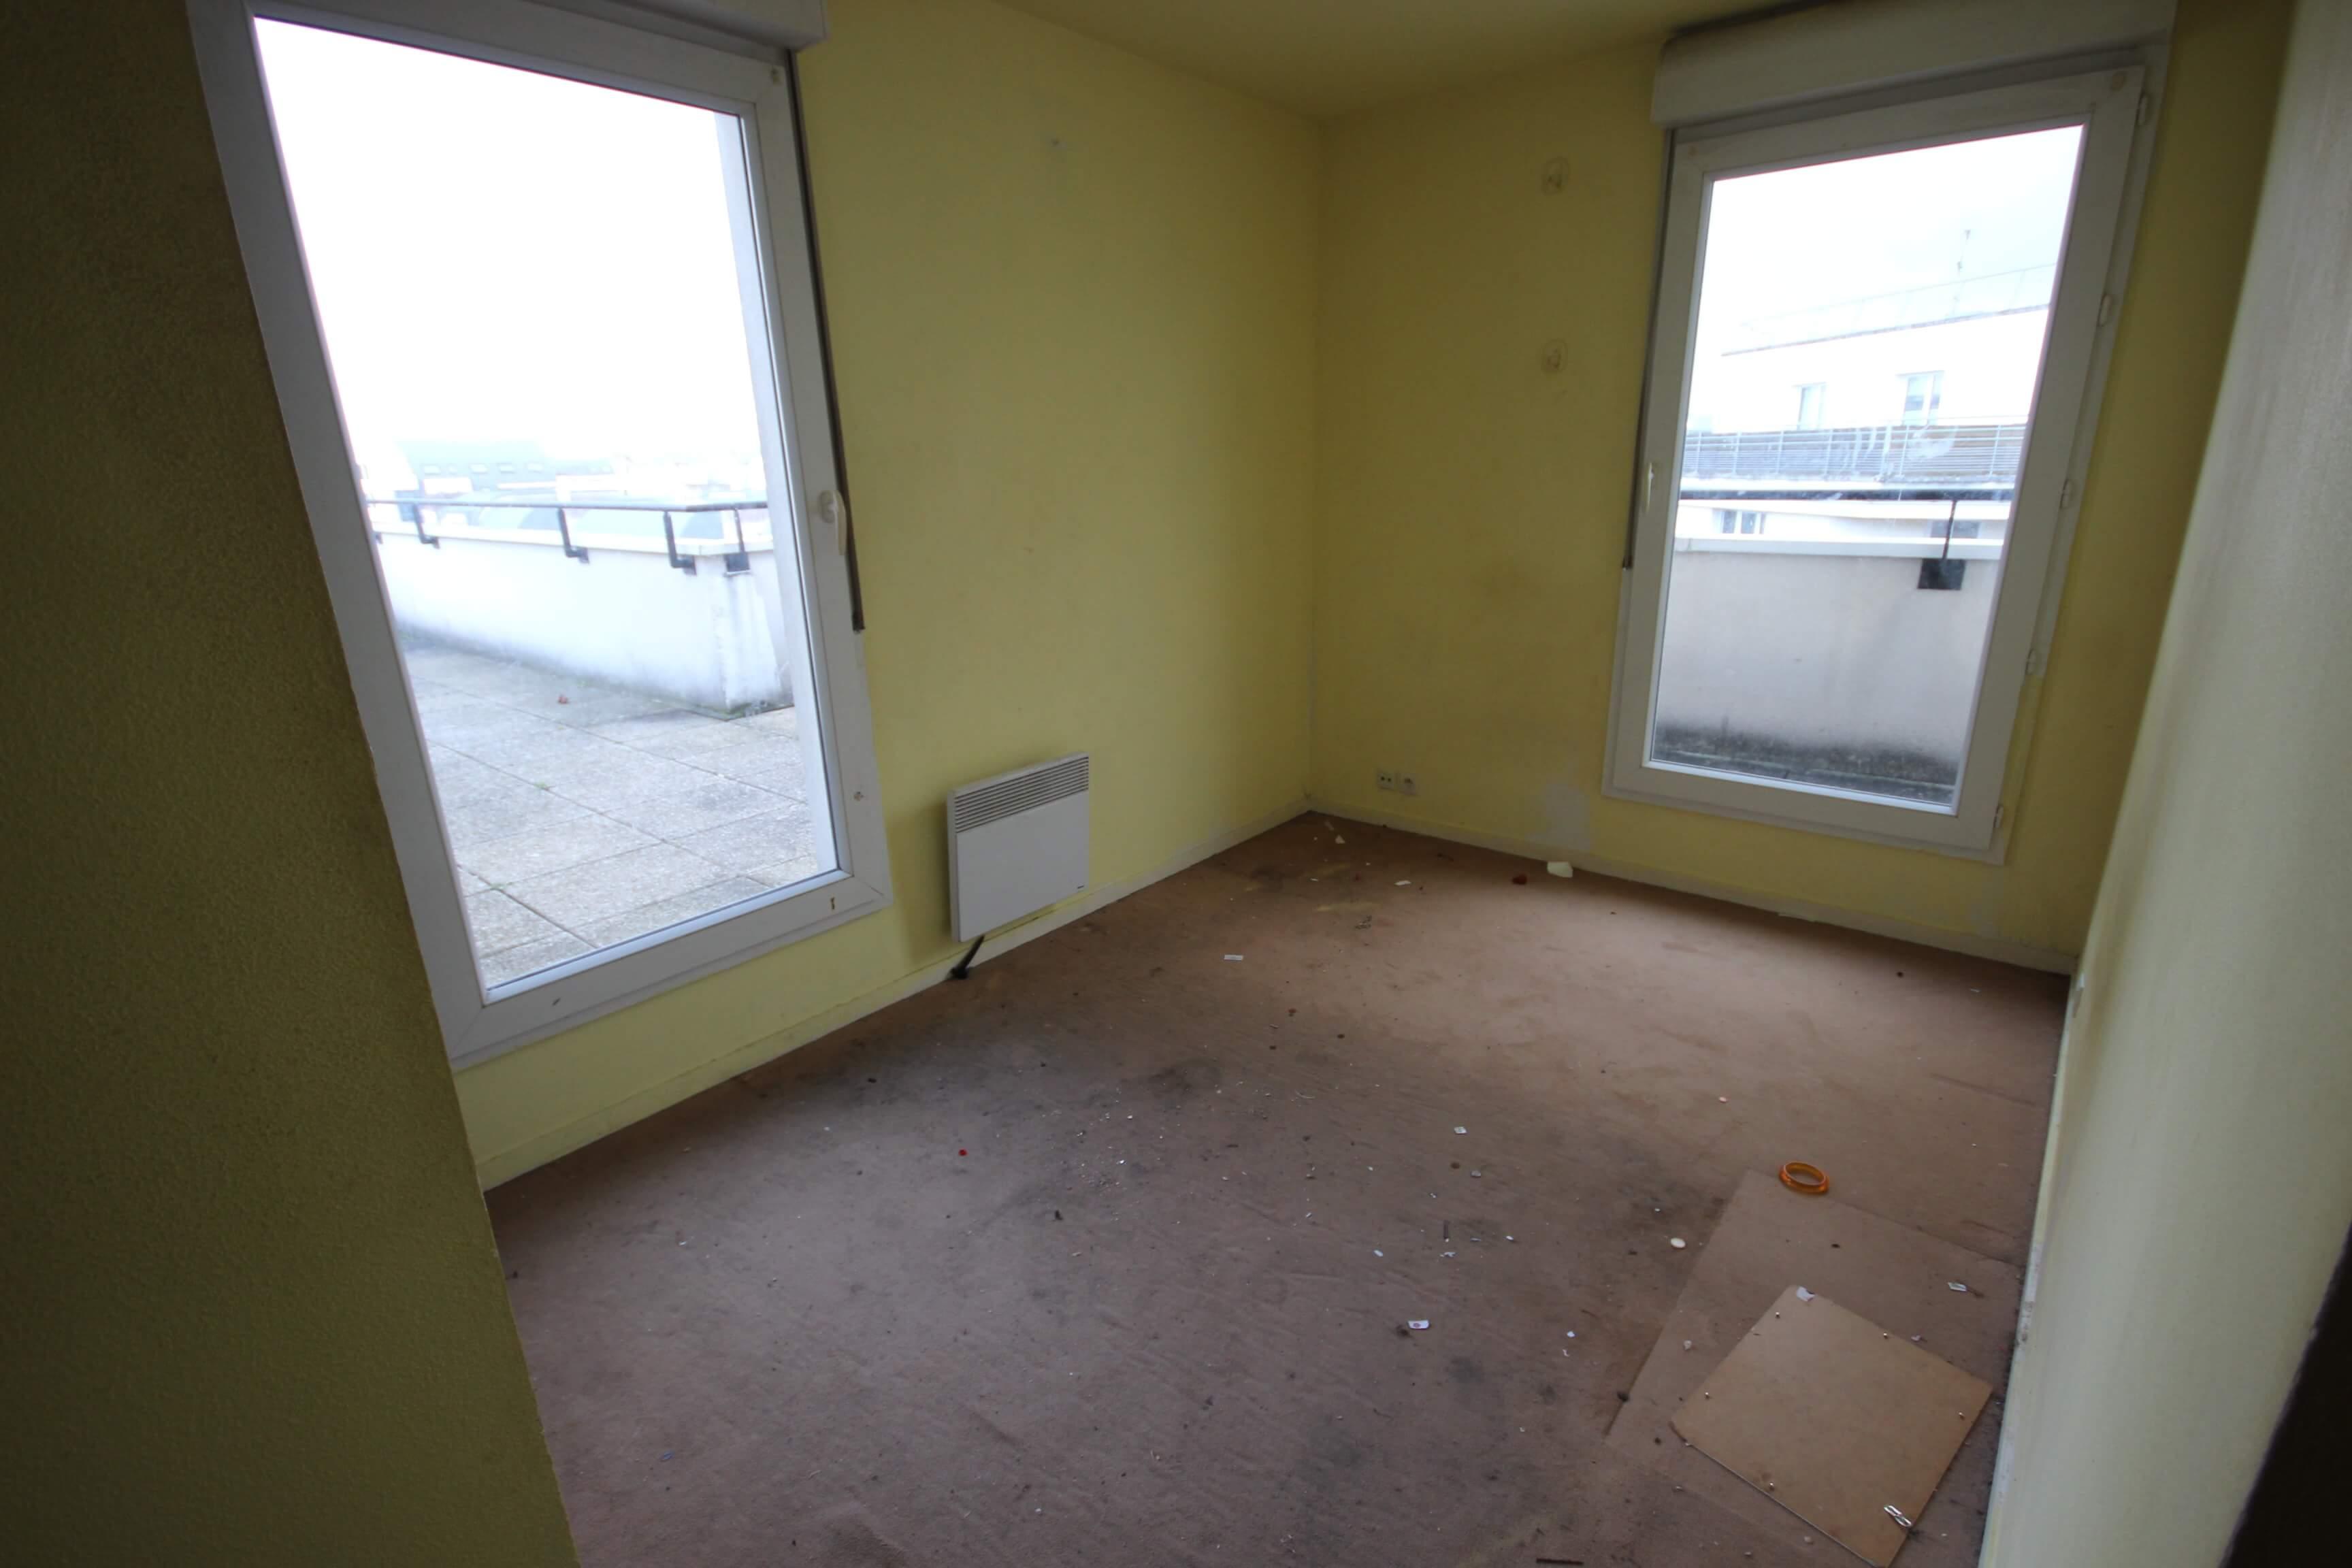 Chambre 2 avant rénovation